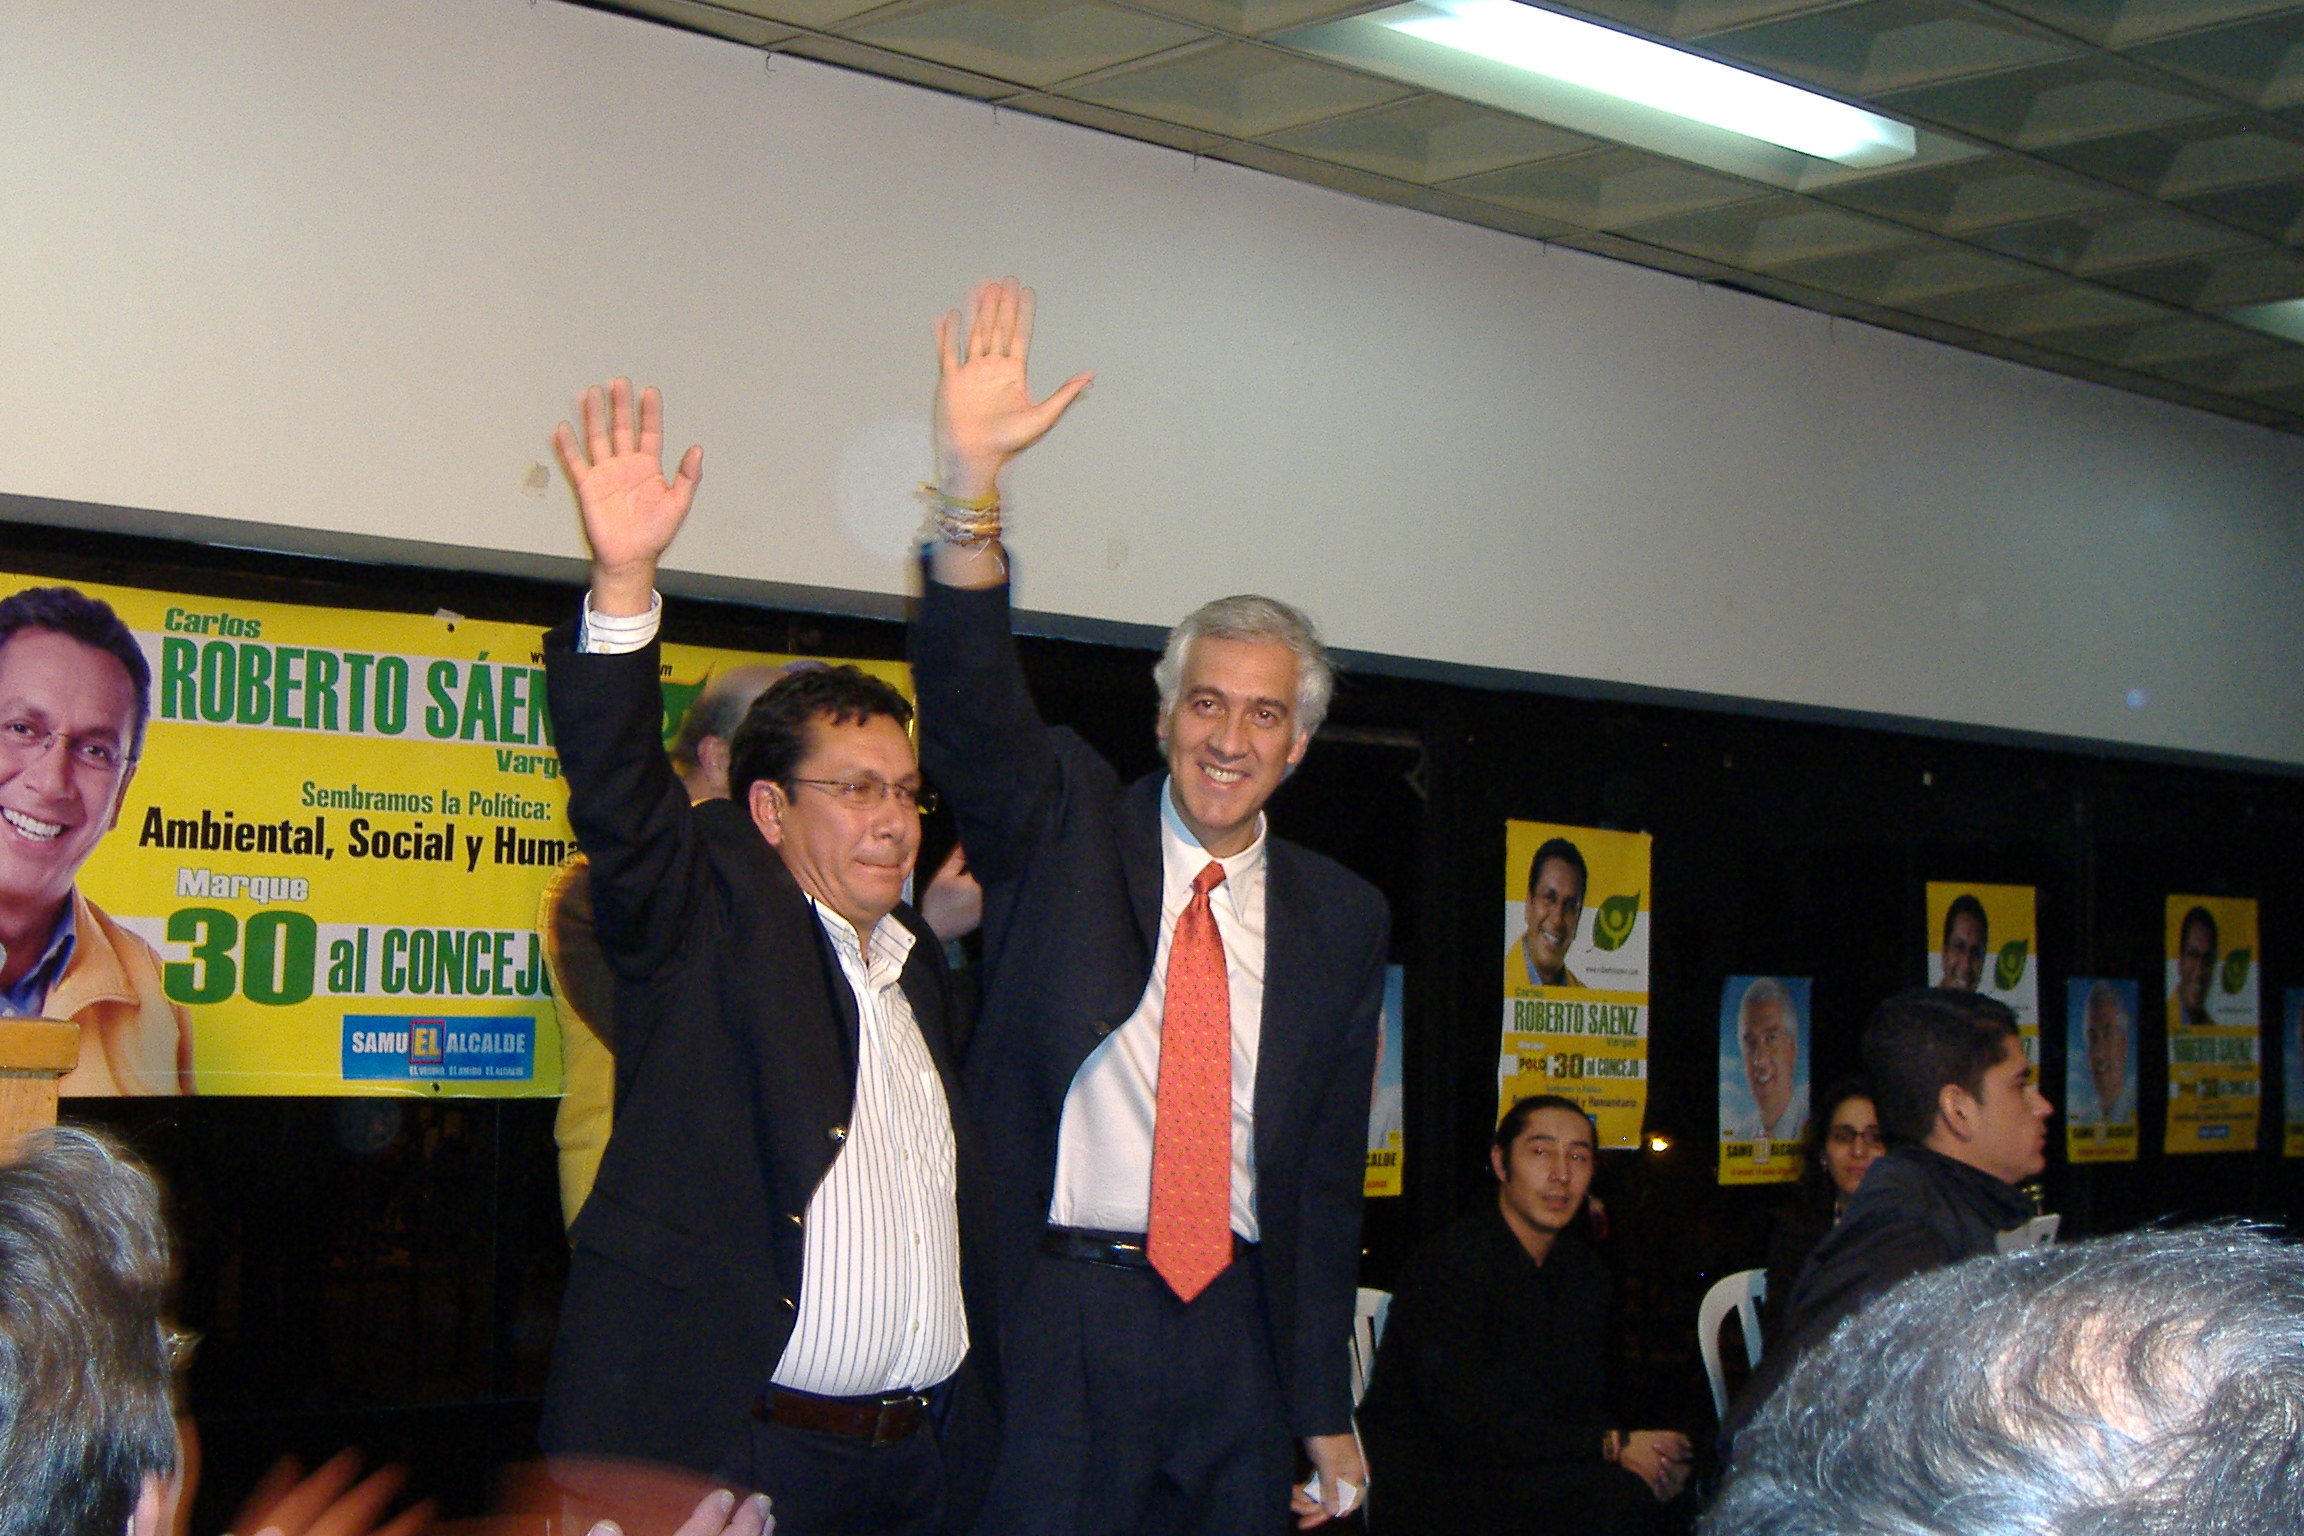 Roberto Sà¡enz et Samuel Moreno